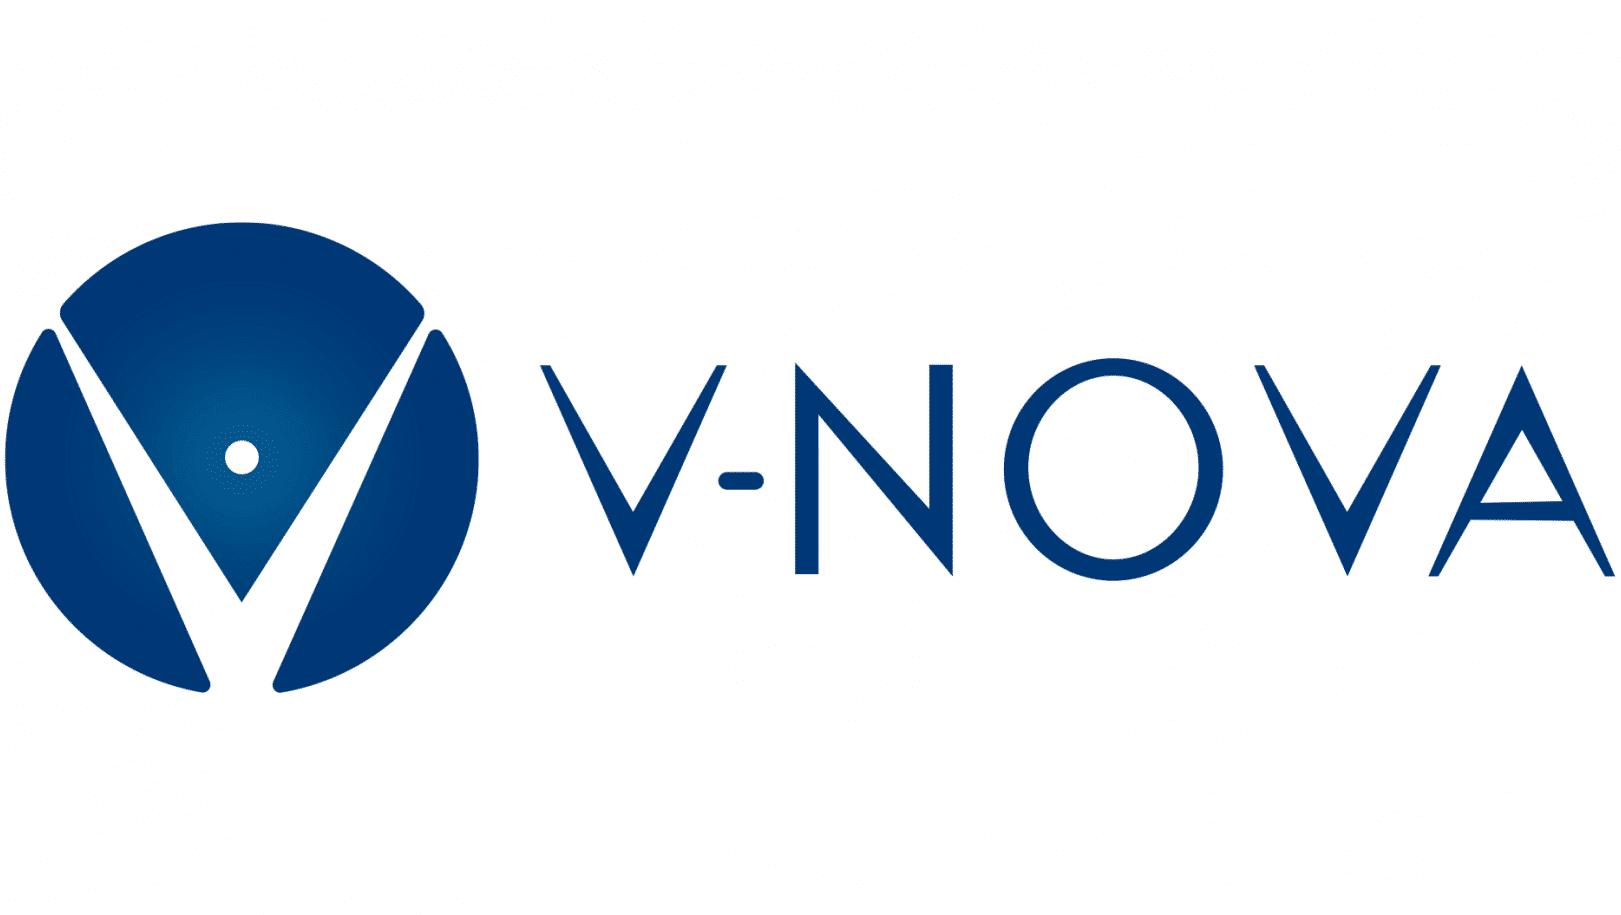 V-nova LCEVC